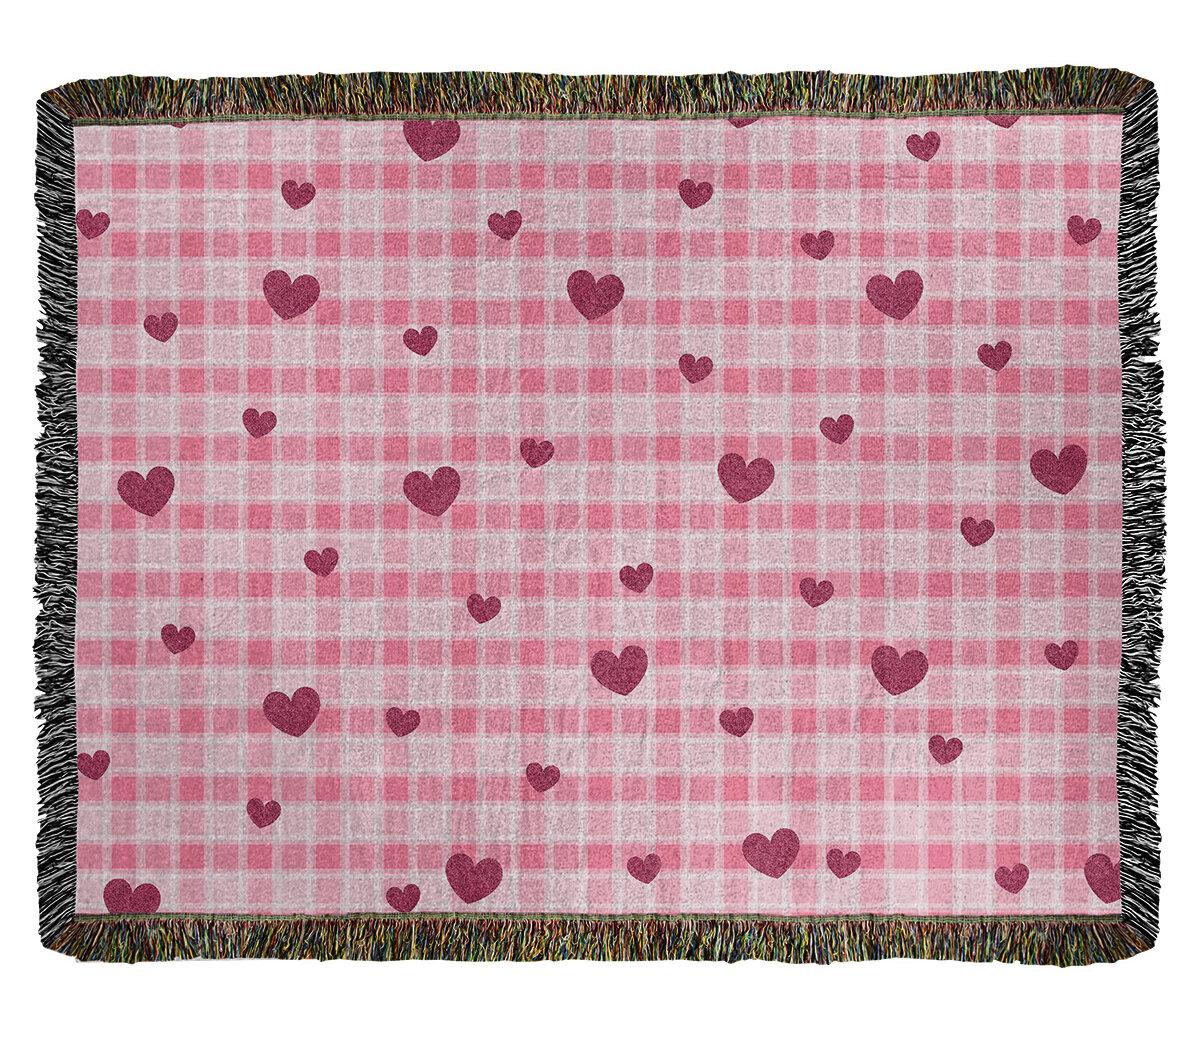 East Urban Home Festive Valentine Day Cotton Throw Wayfair